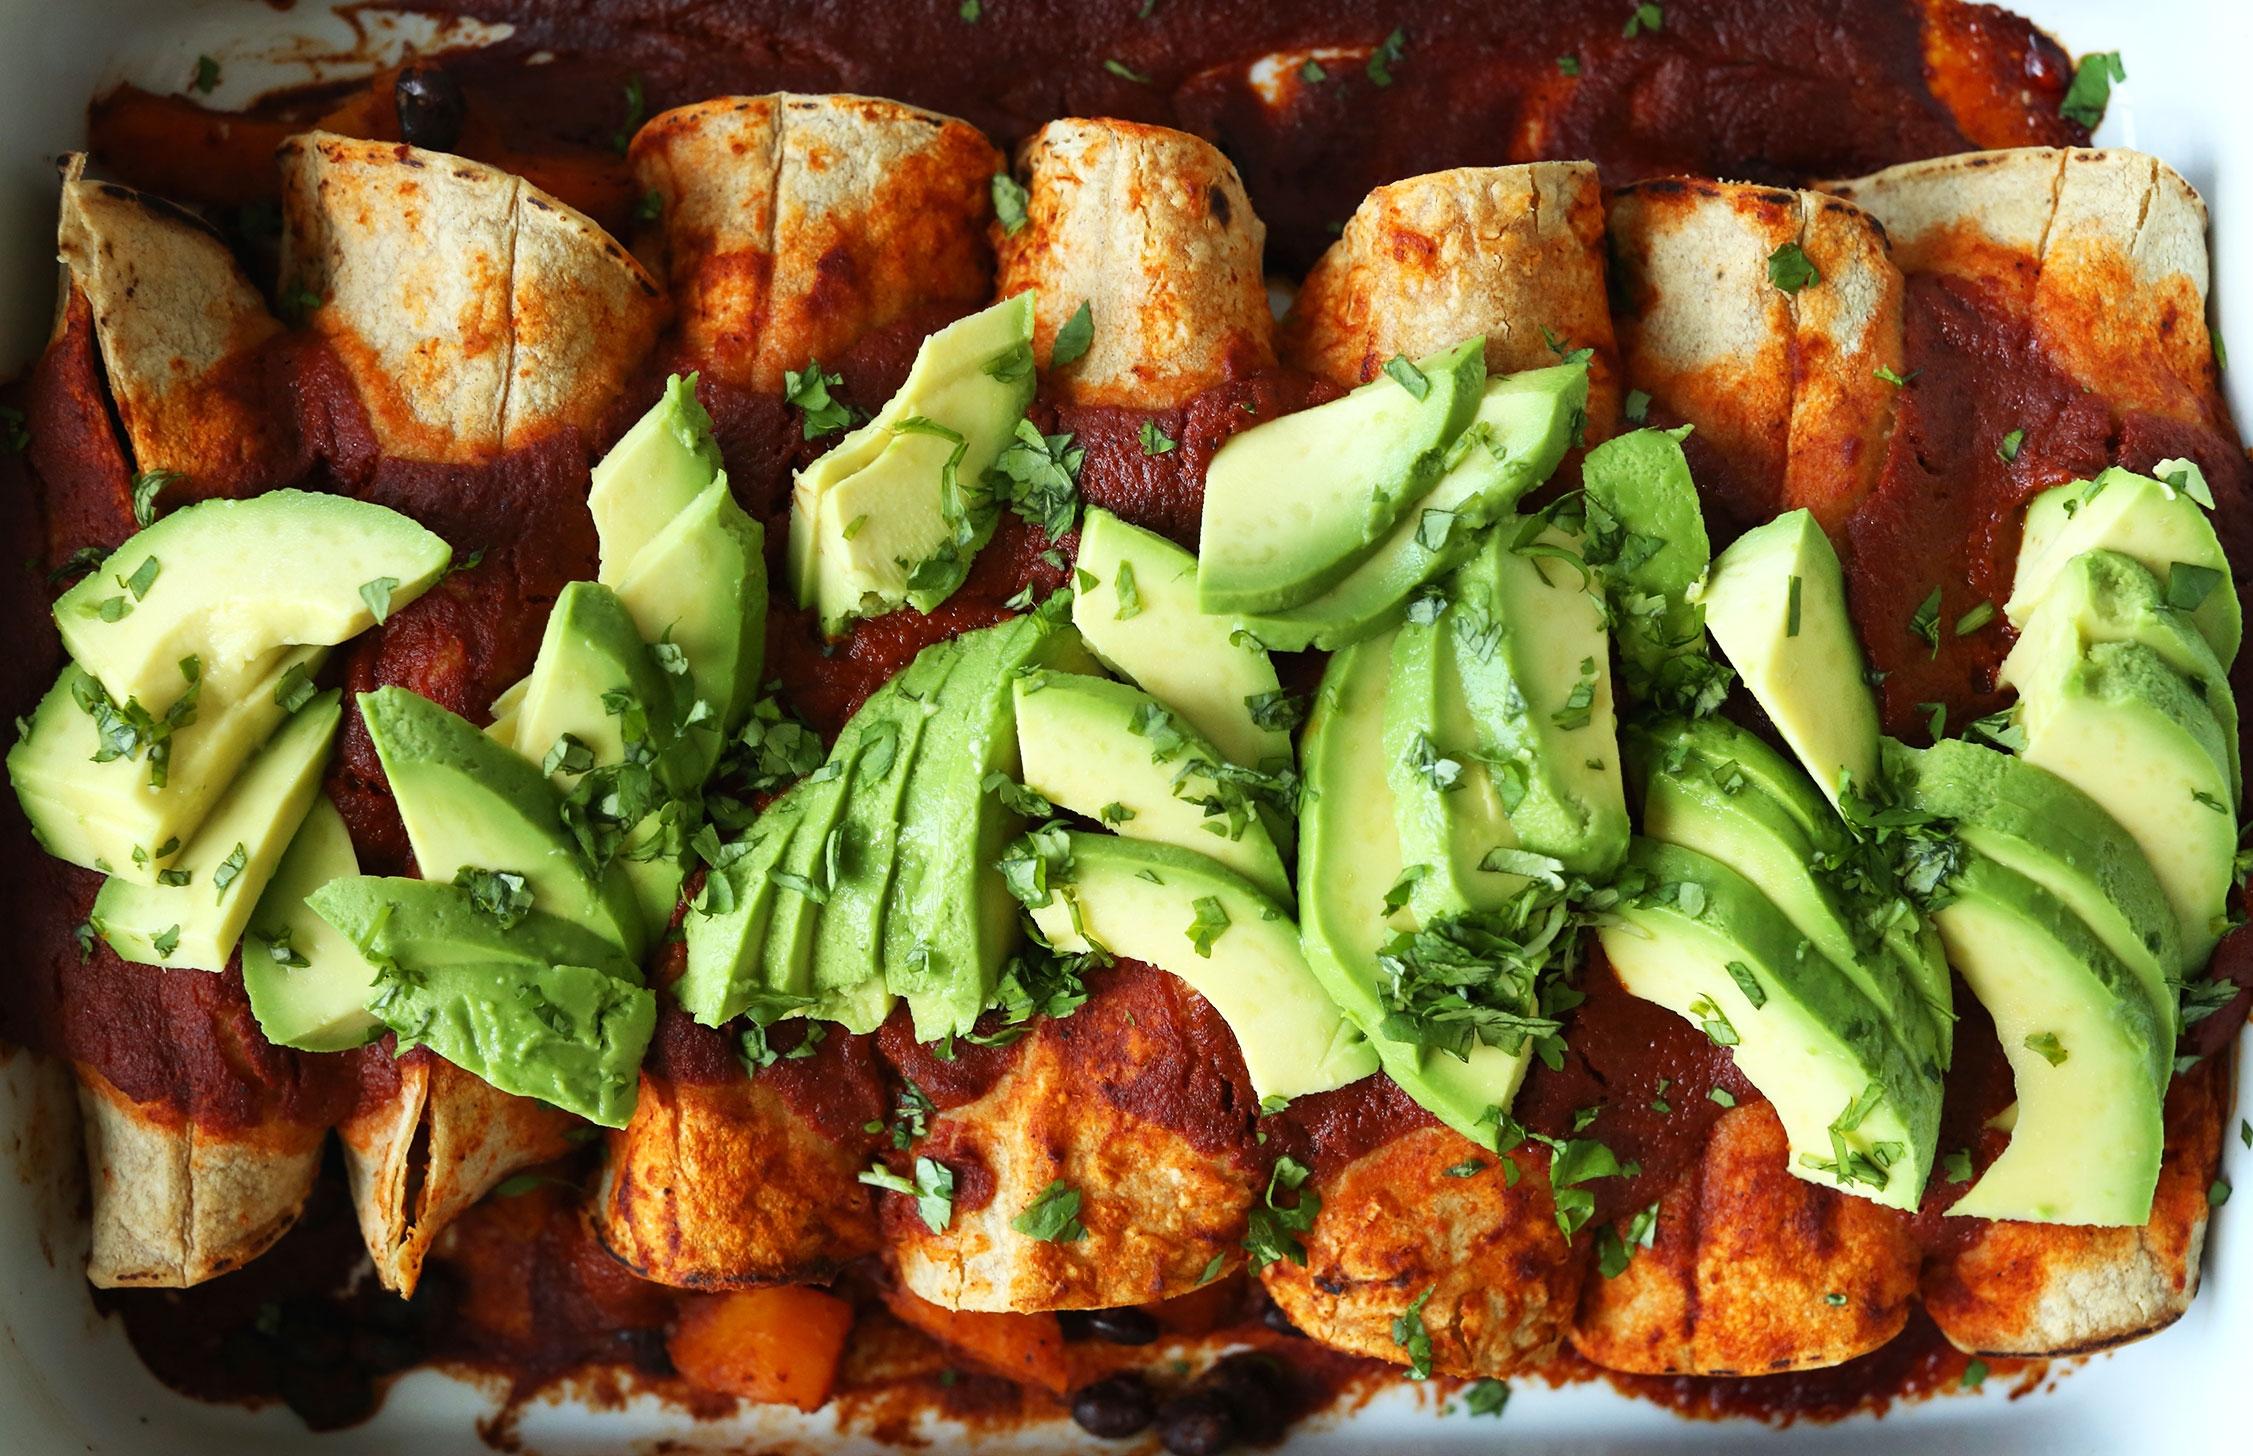 HEALTHY-10-Ingredient-Butternut-Squash-Enchiladas-Simple-methods-and-ingredients-and-AMAZING-results-plantbased-vegan-glutenfree-enchiladas-recipe-dinner.jpg